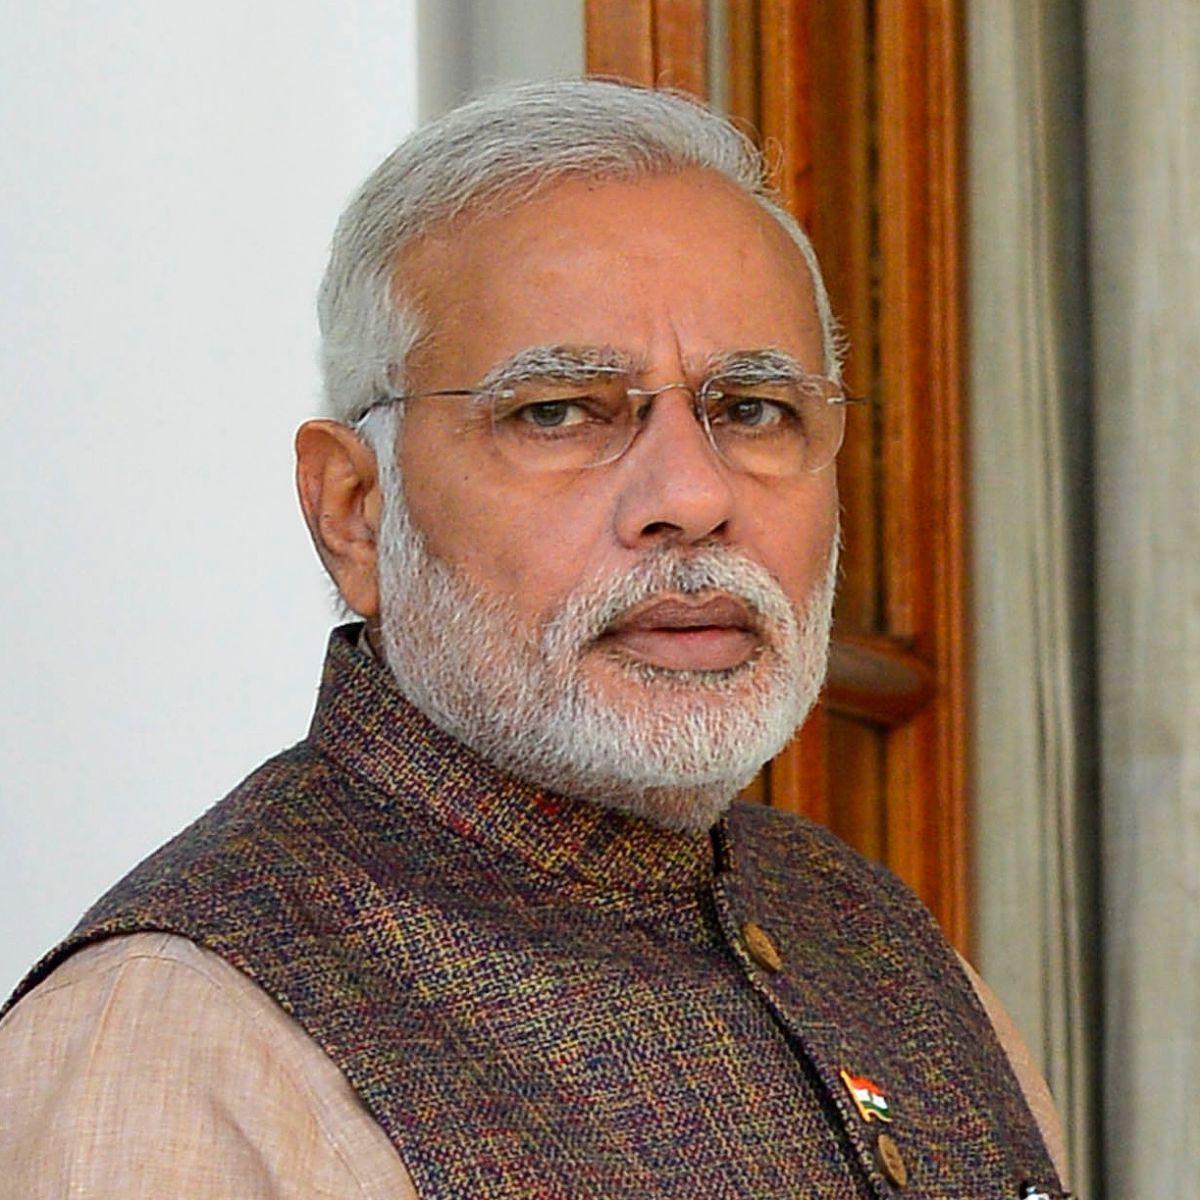 Prime minister modi biography